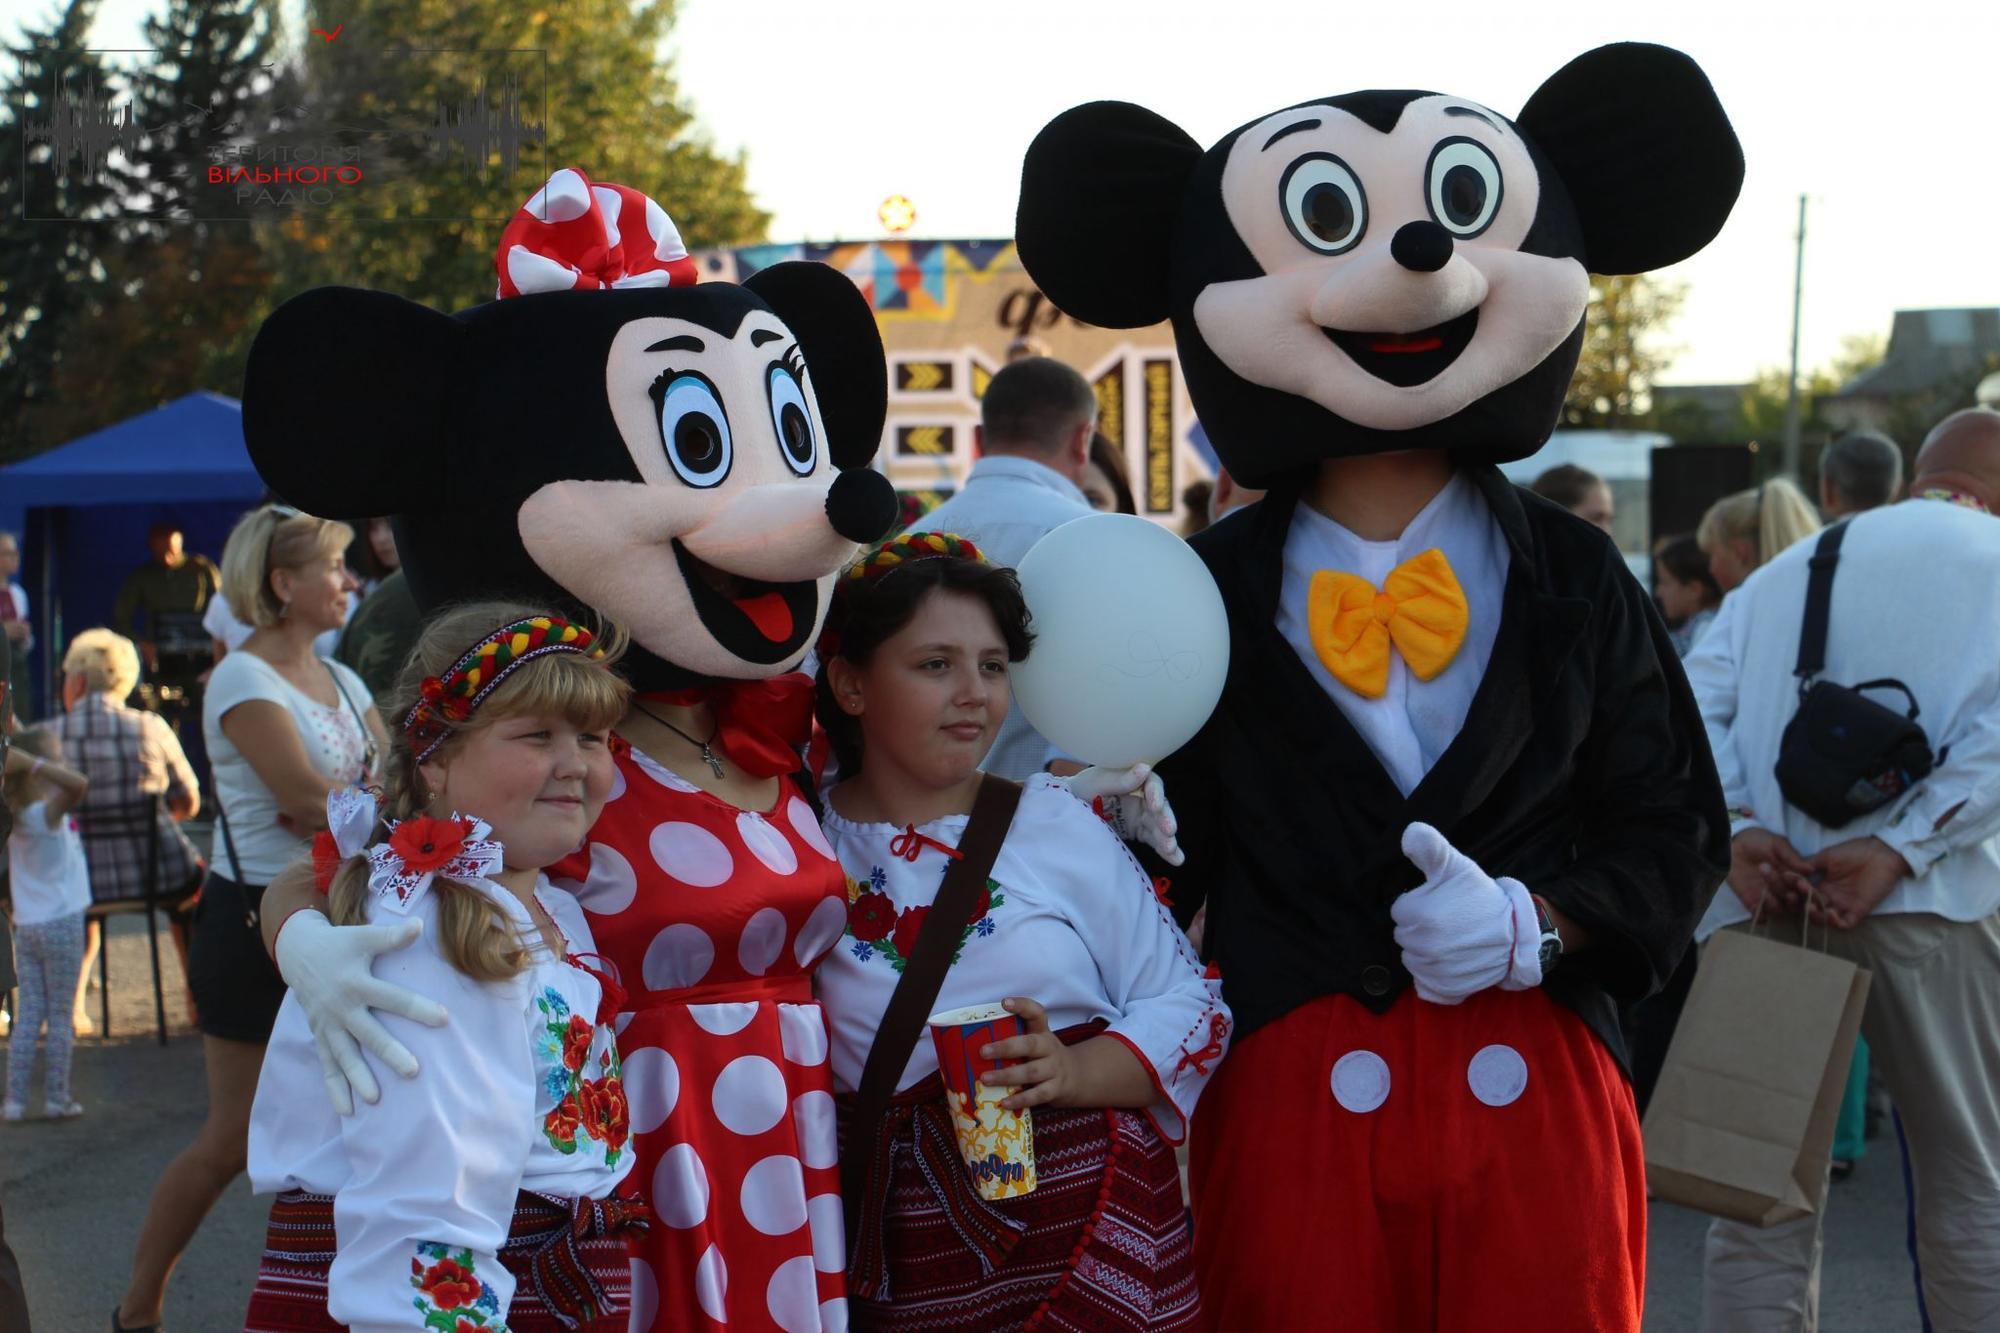 етно-фестиваль Донецька область, Роздолівка